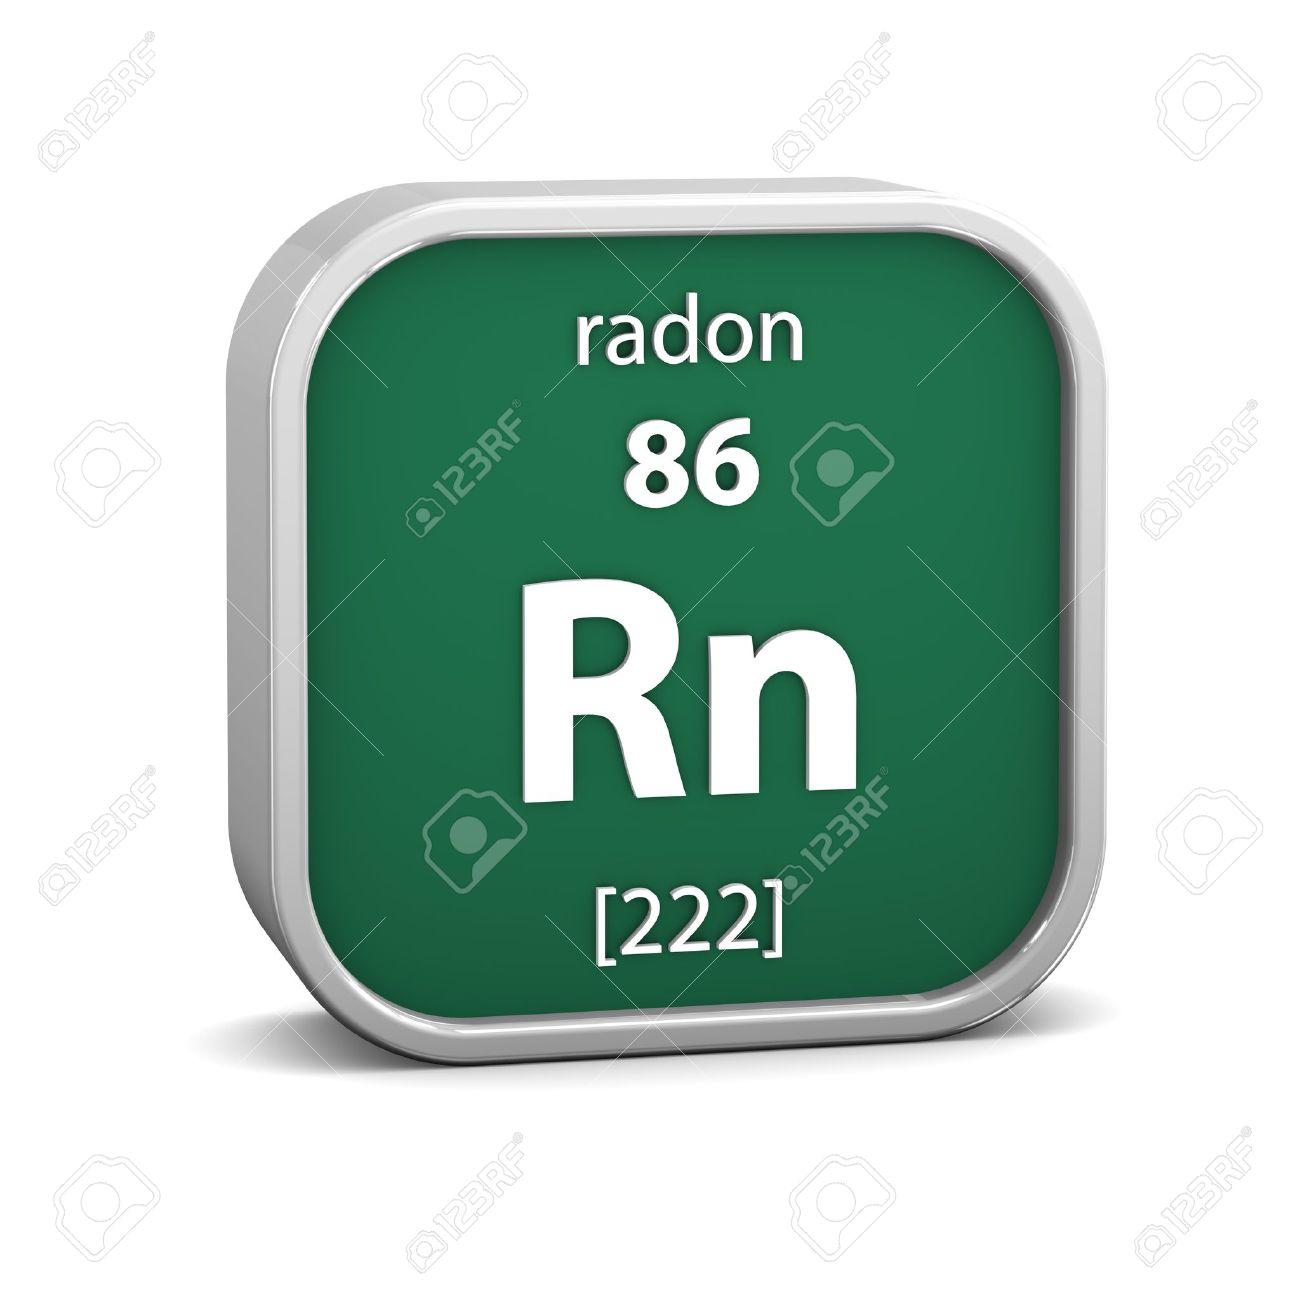 Periodic table radon gallery periodic table images radon on the periodic table image collections periodic table images radon on the periodic table images gamestrikefo Image collections